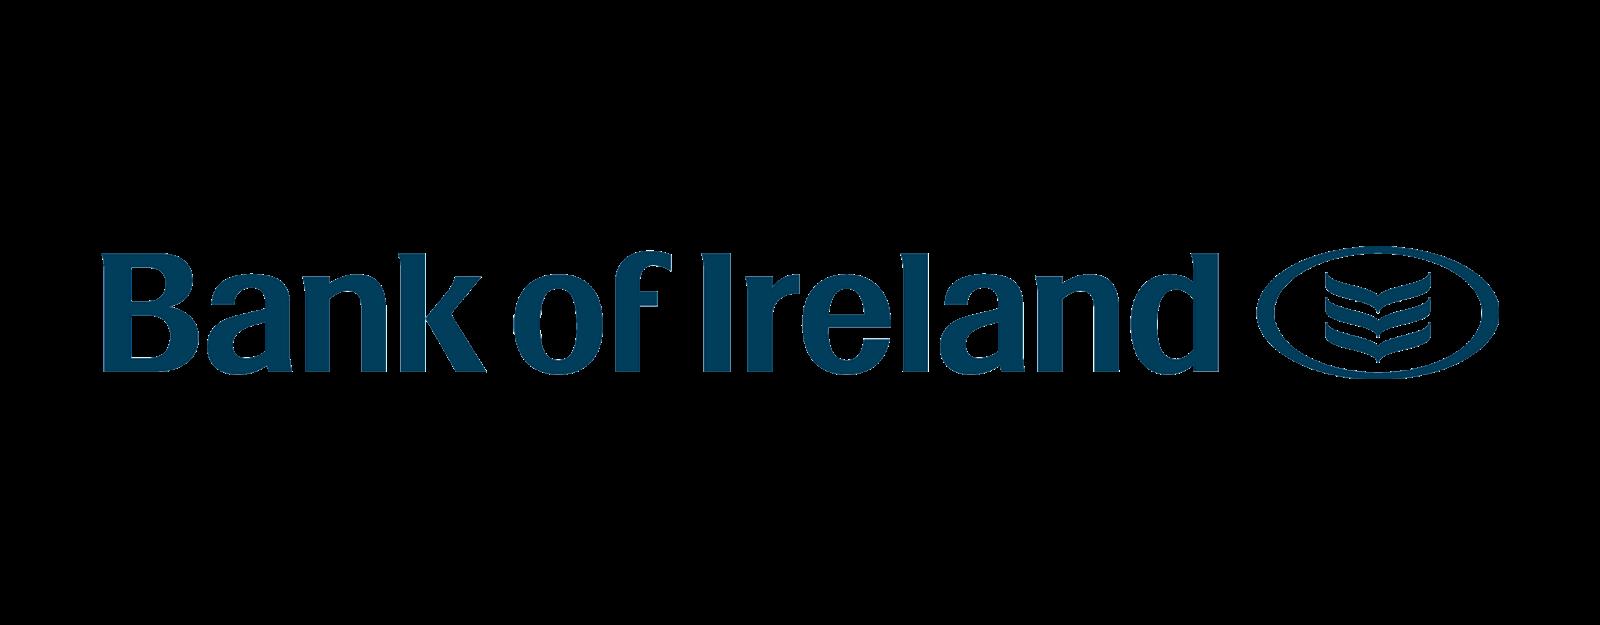 Bank of Ireland Logo PNG Format